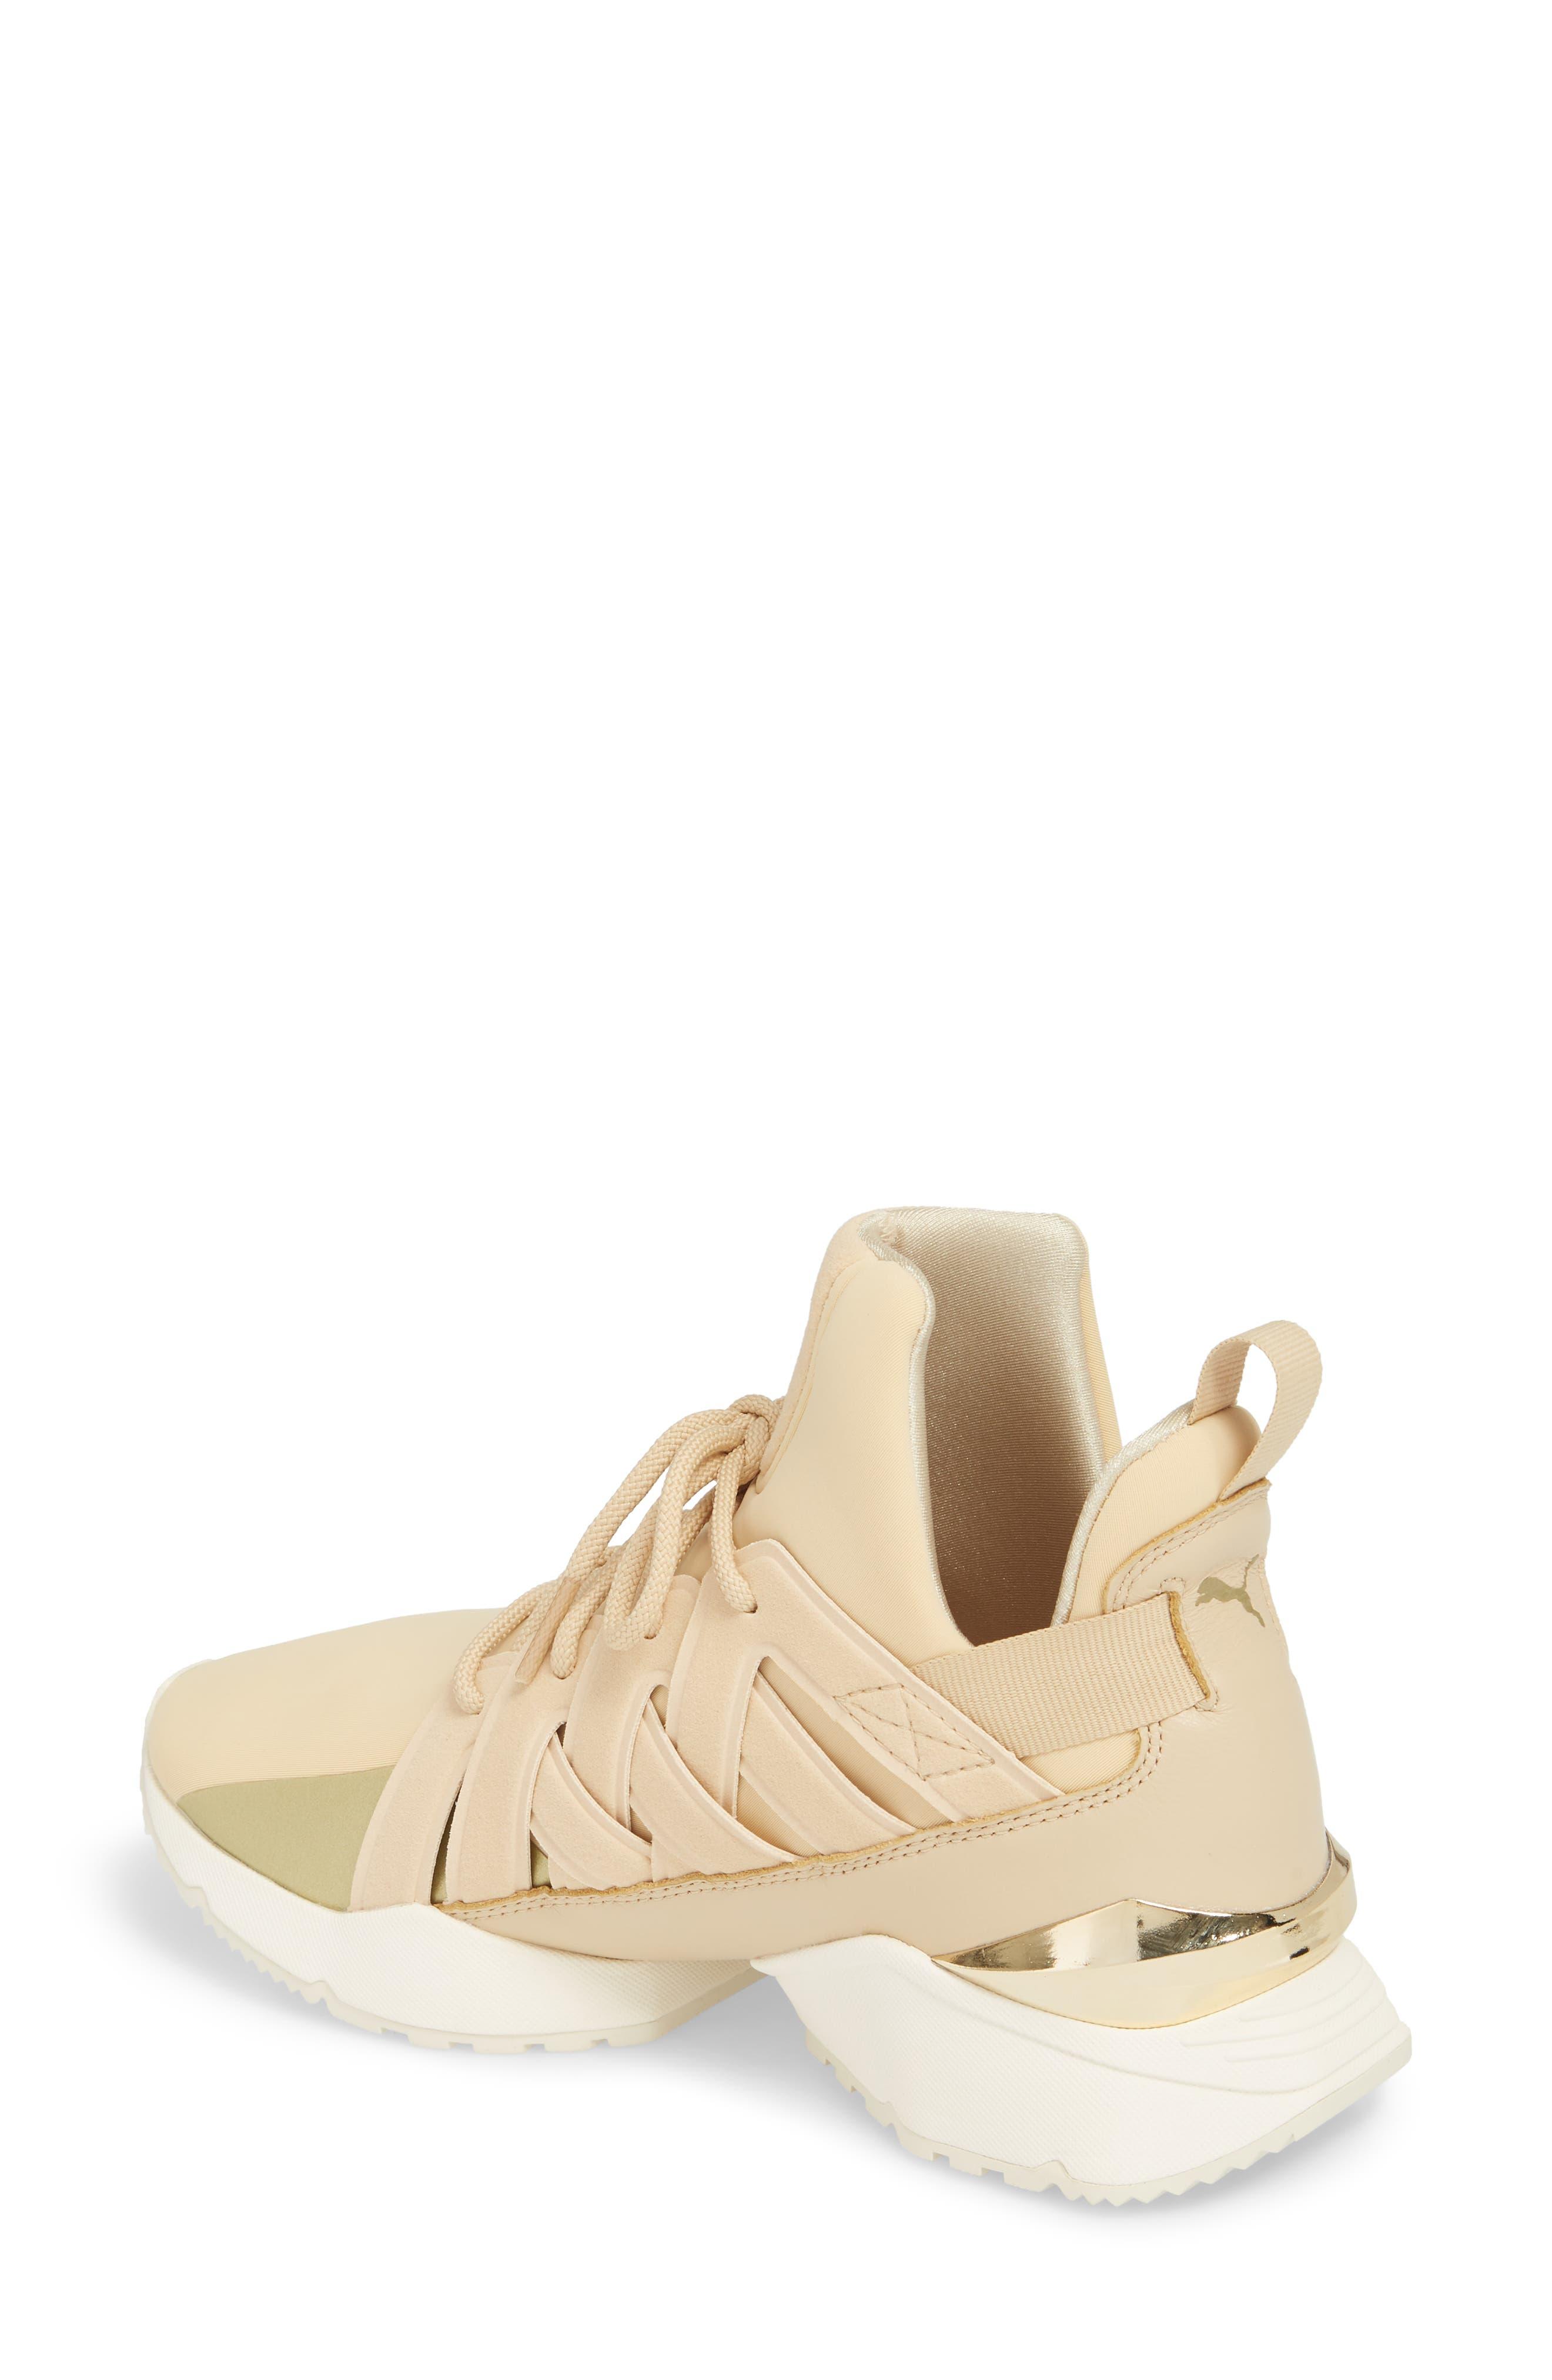 Muse Echo Sneaker,                             Alternate thumbnail 2, color,                             Pebble/ Metallic Gold